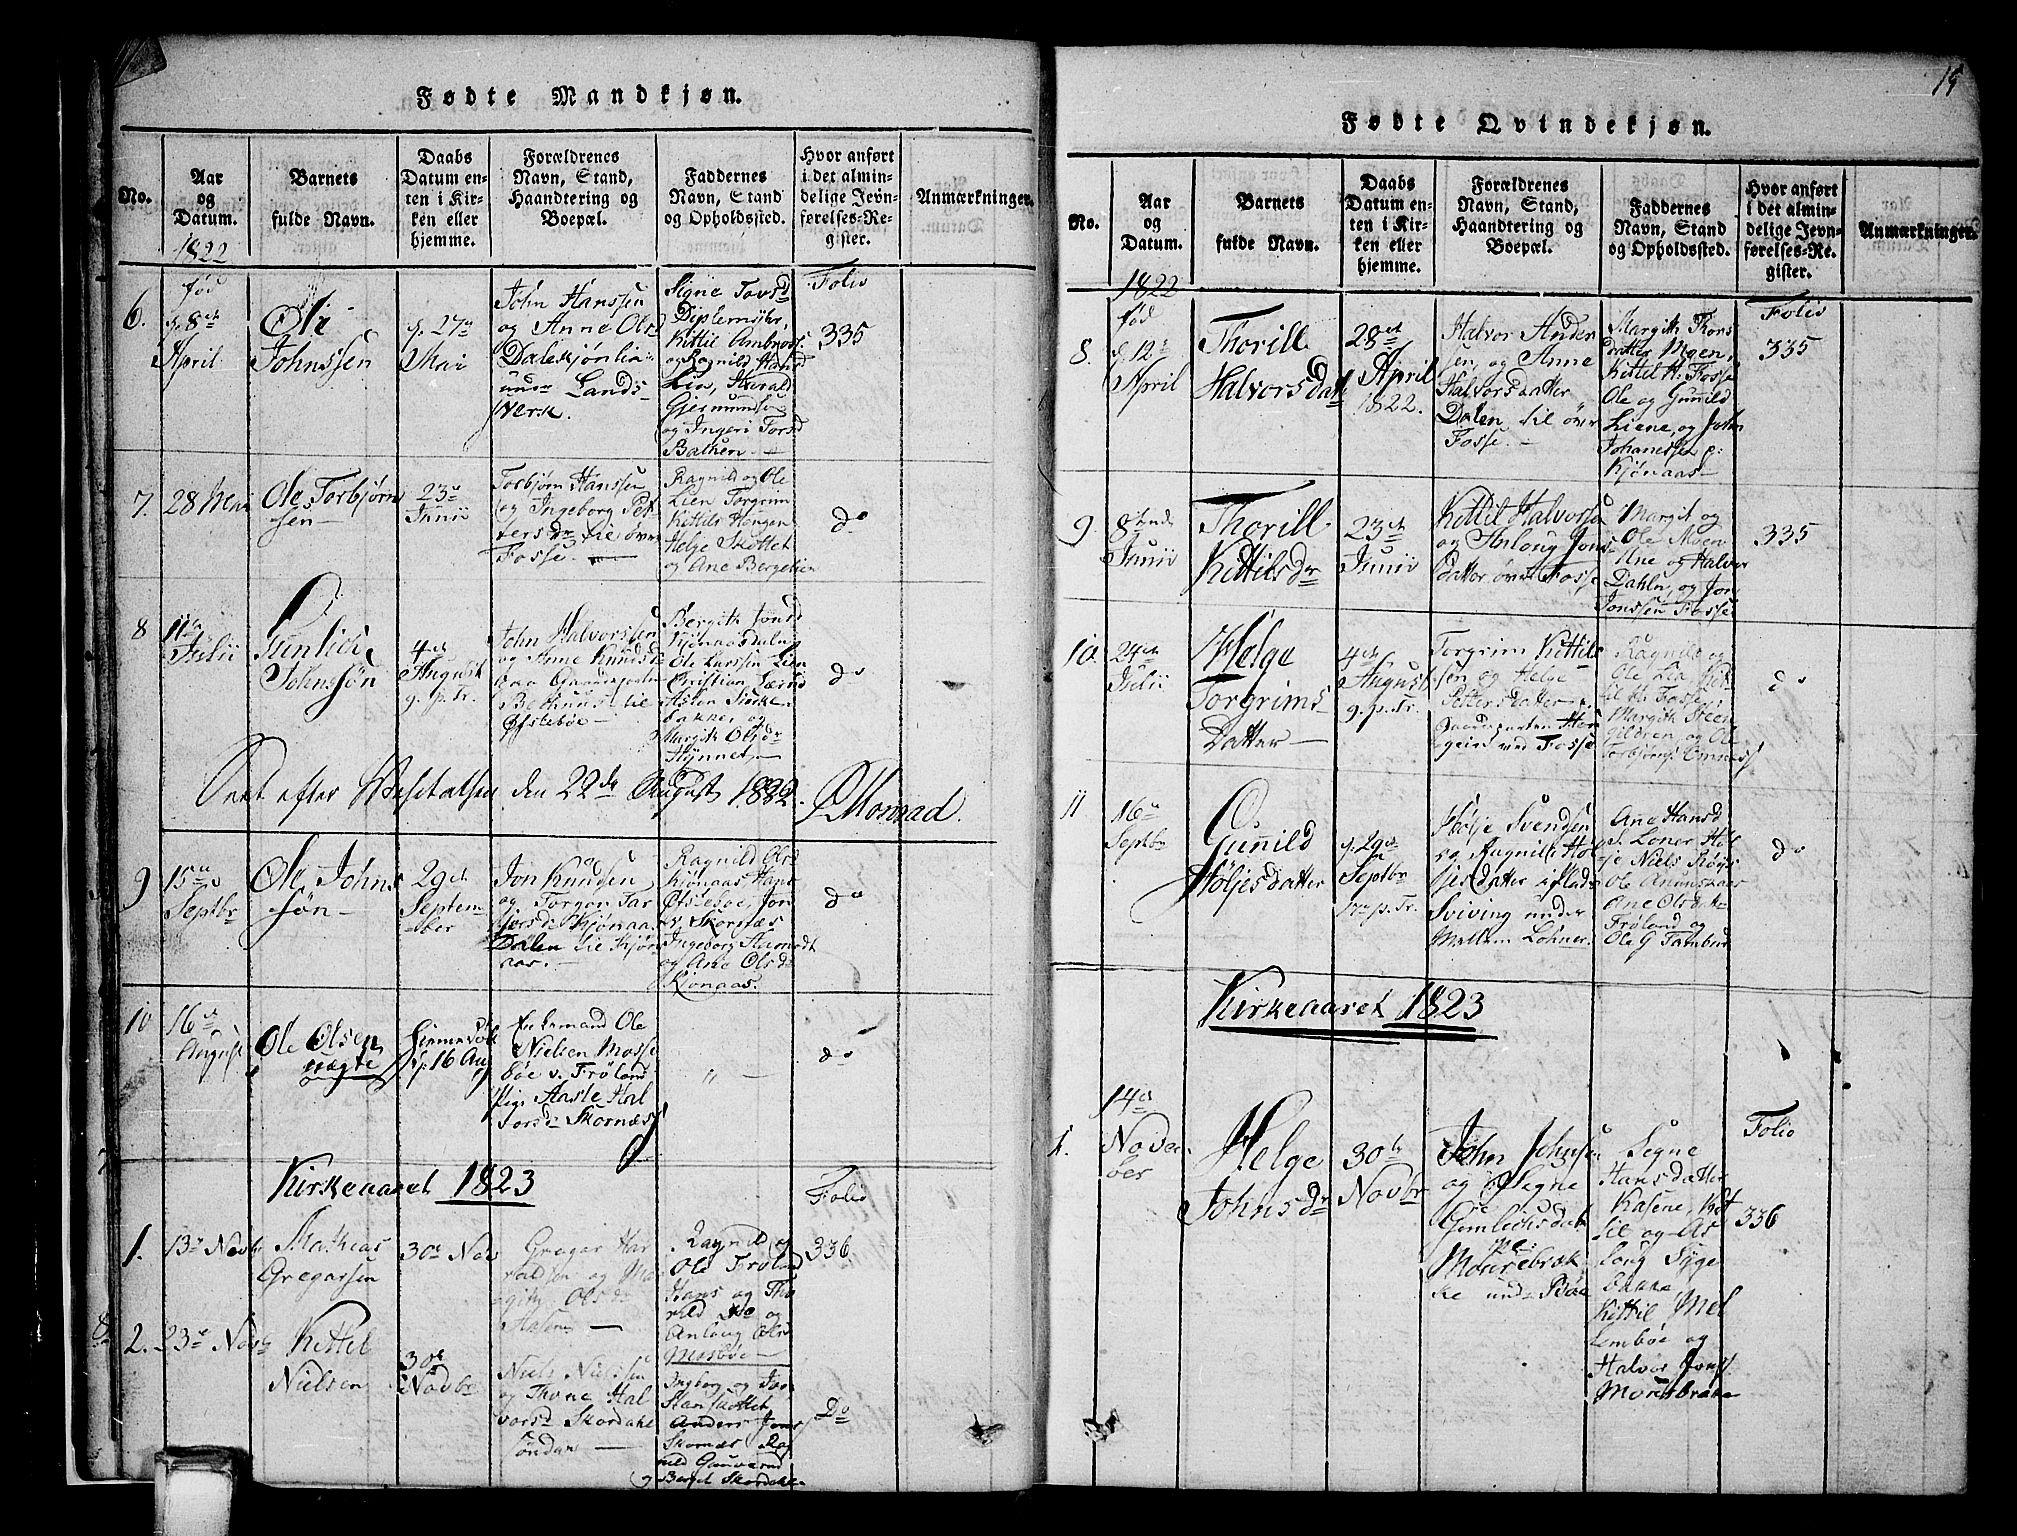 SAKO, Hjartdal kirkebøker, G/Gb/L0001: Klokkerbok nr. II 1, 1815-1842, s. 15